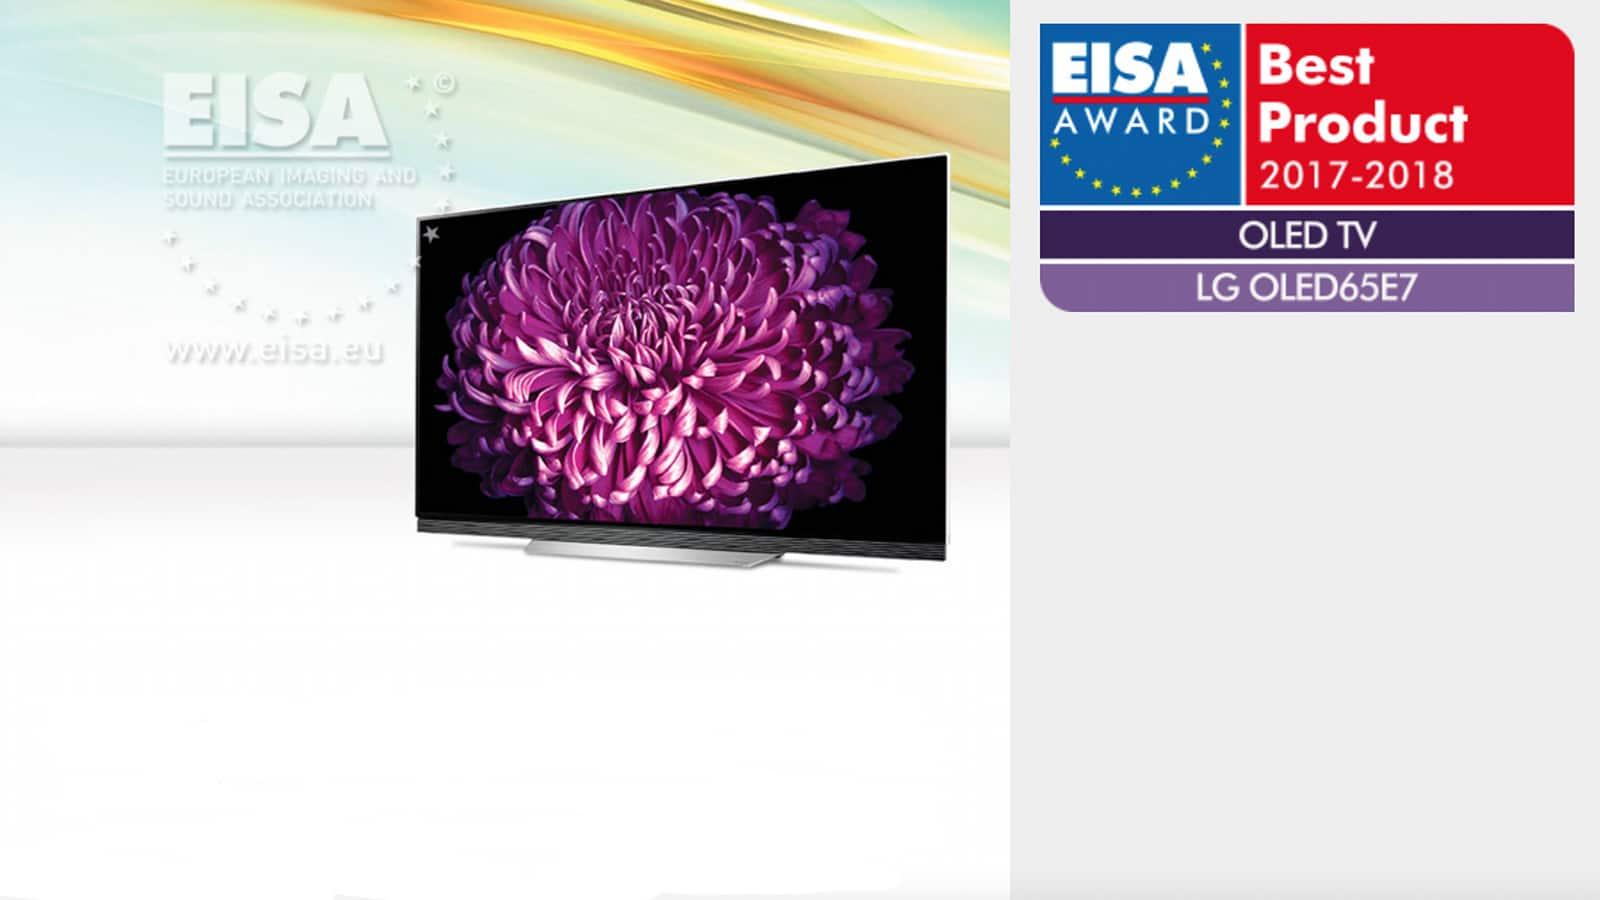 lg-oled65e7-wins-eisa-award